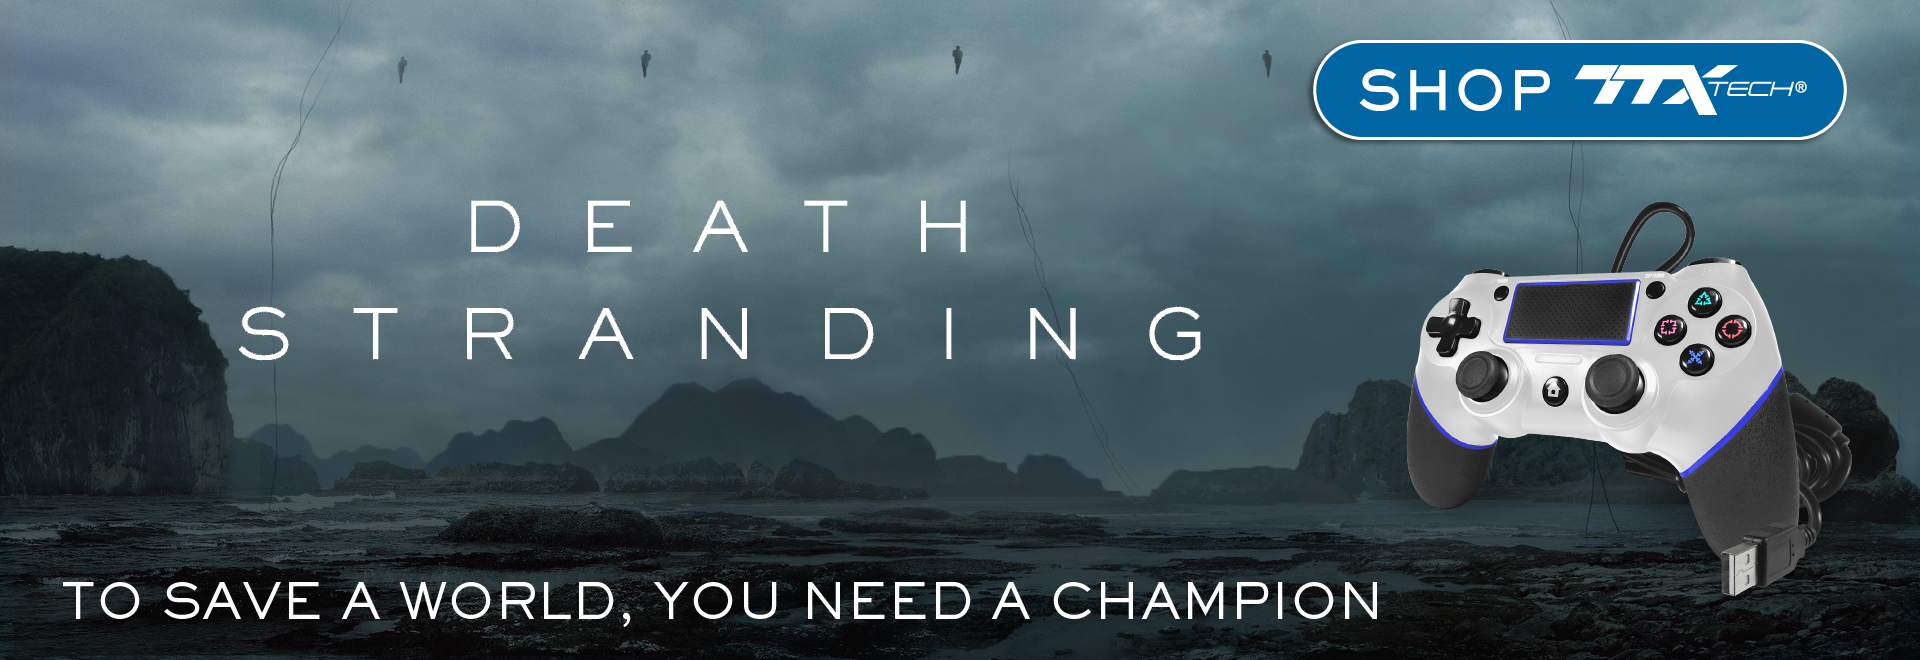 TTX Tech, Champion, PS4, controller, Death Stranding